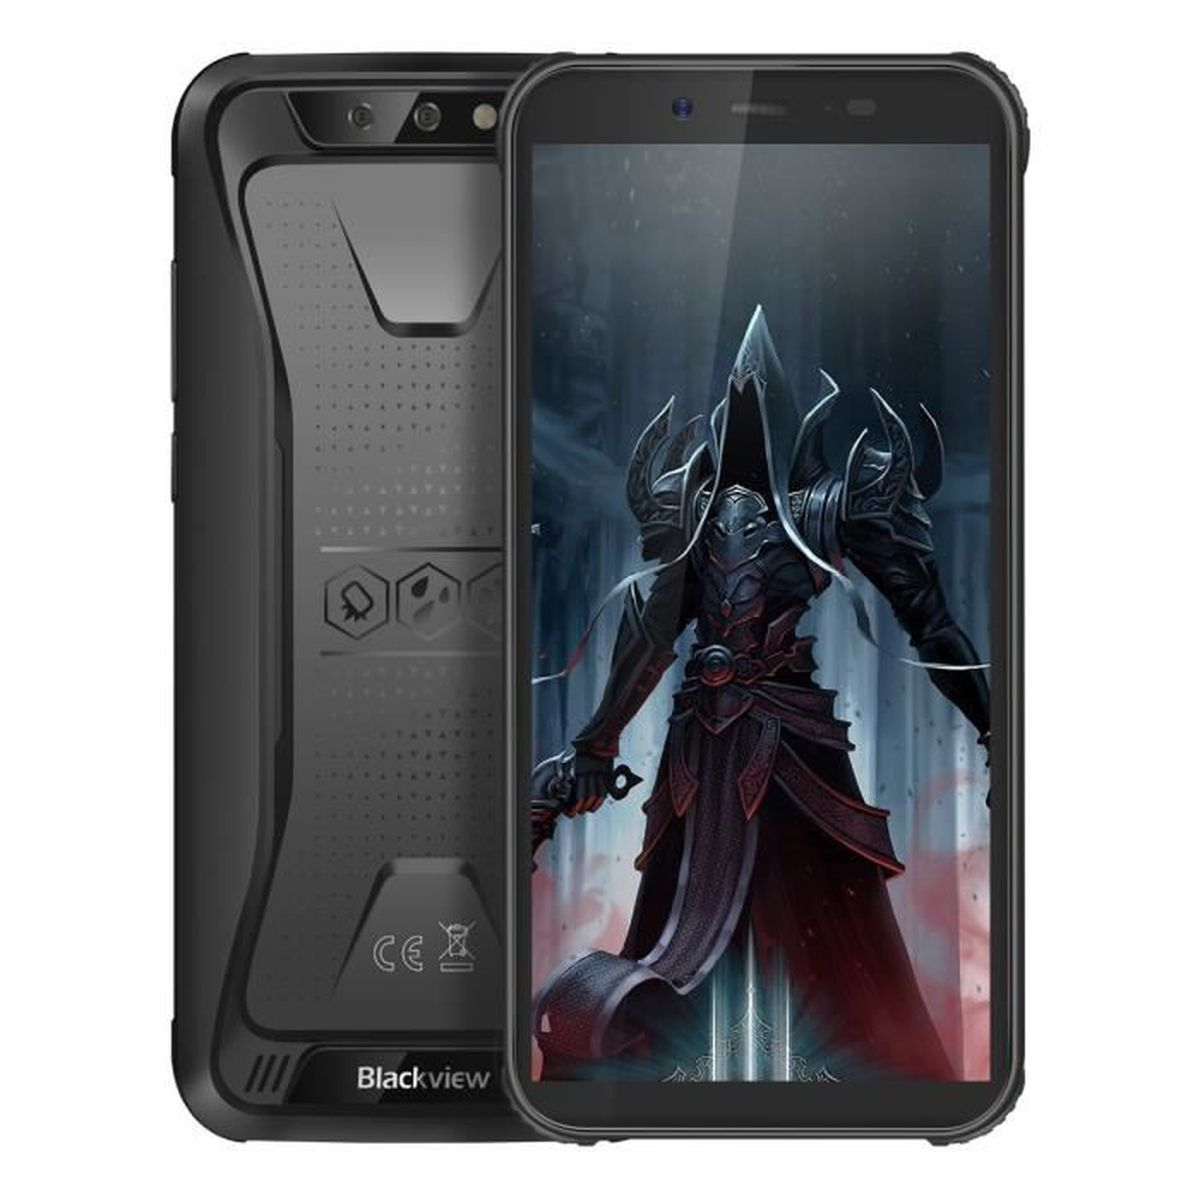 "SMARTPHONE Blackview BV5500 Pro 5.5"" Smartphone 3GB + 16GB 4G"